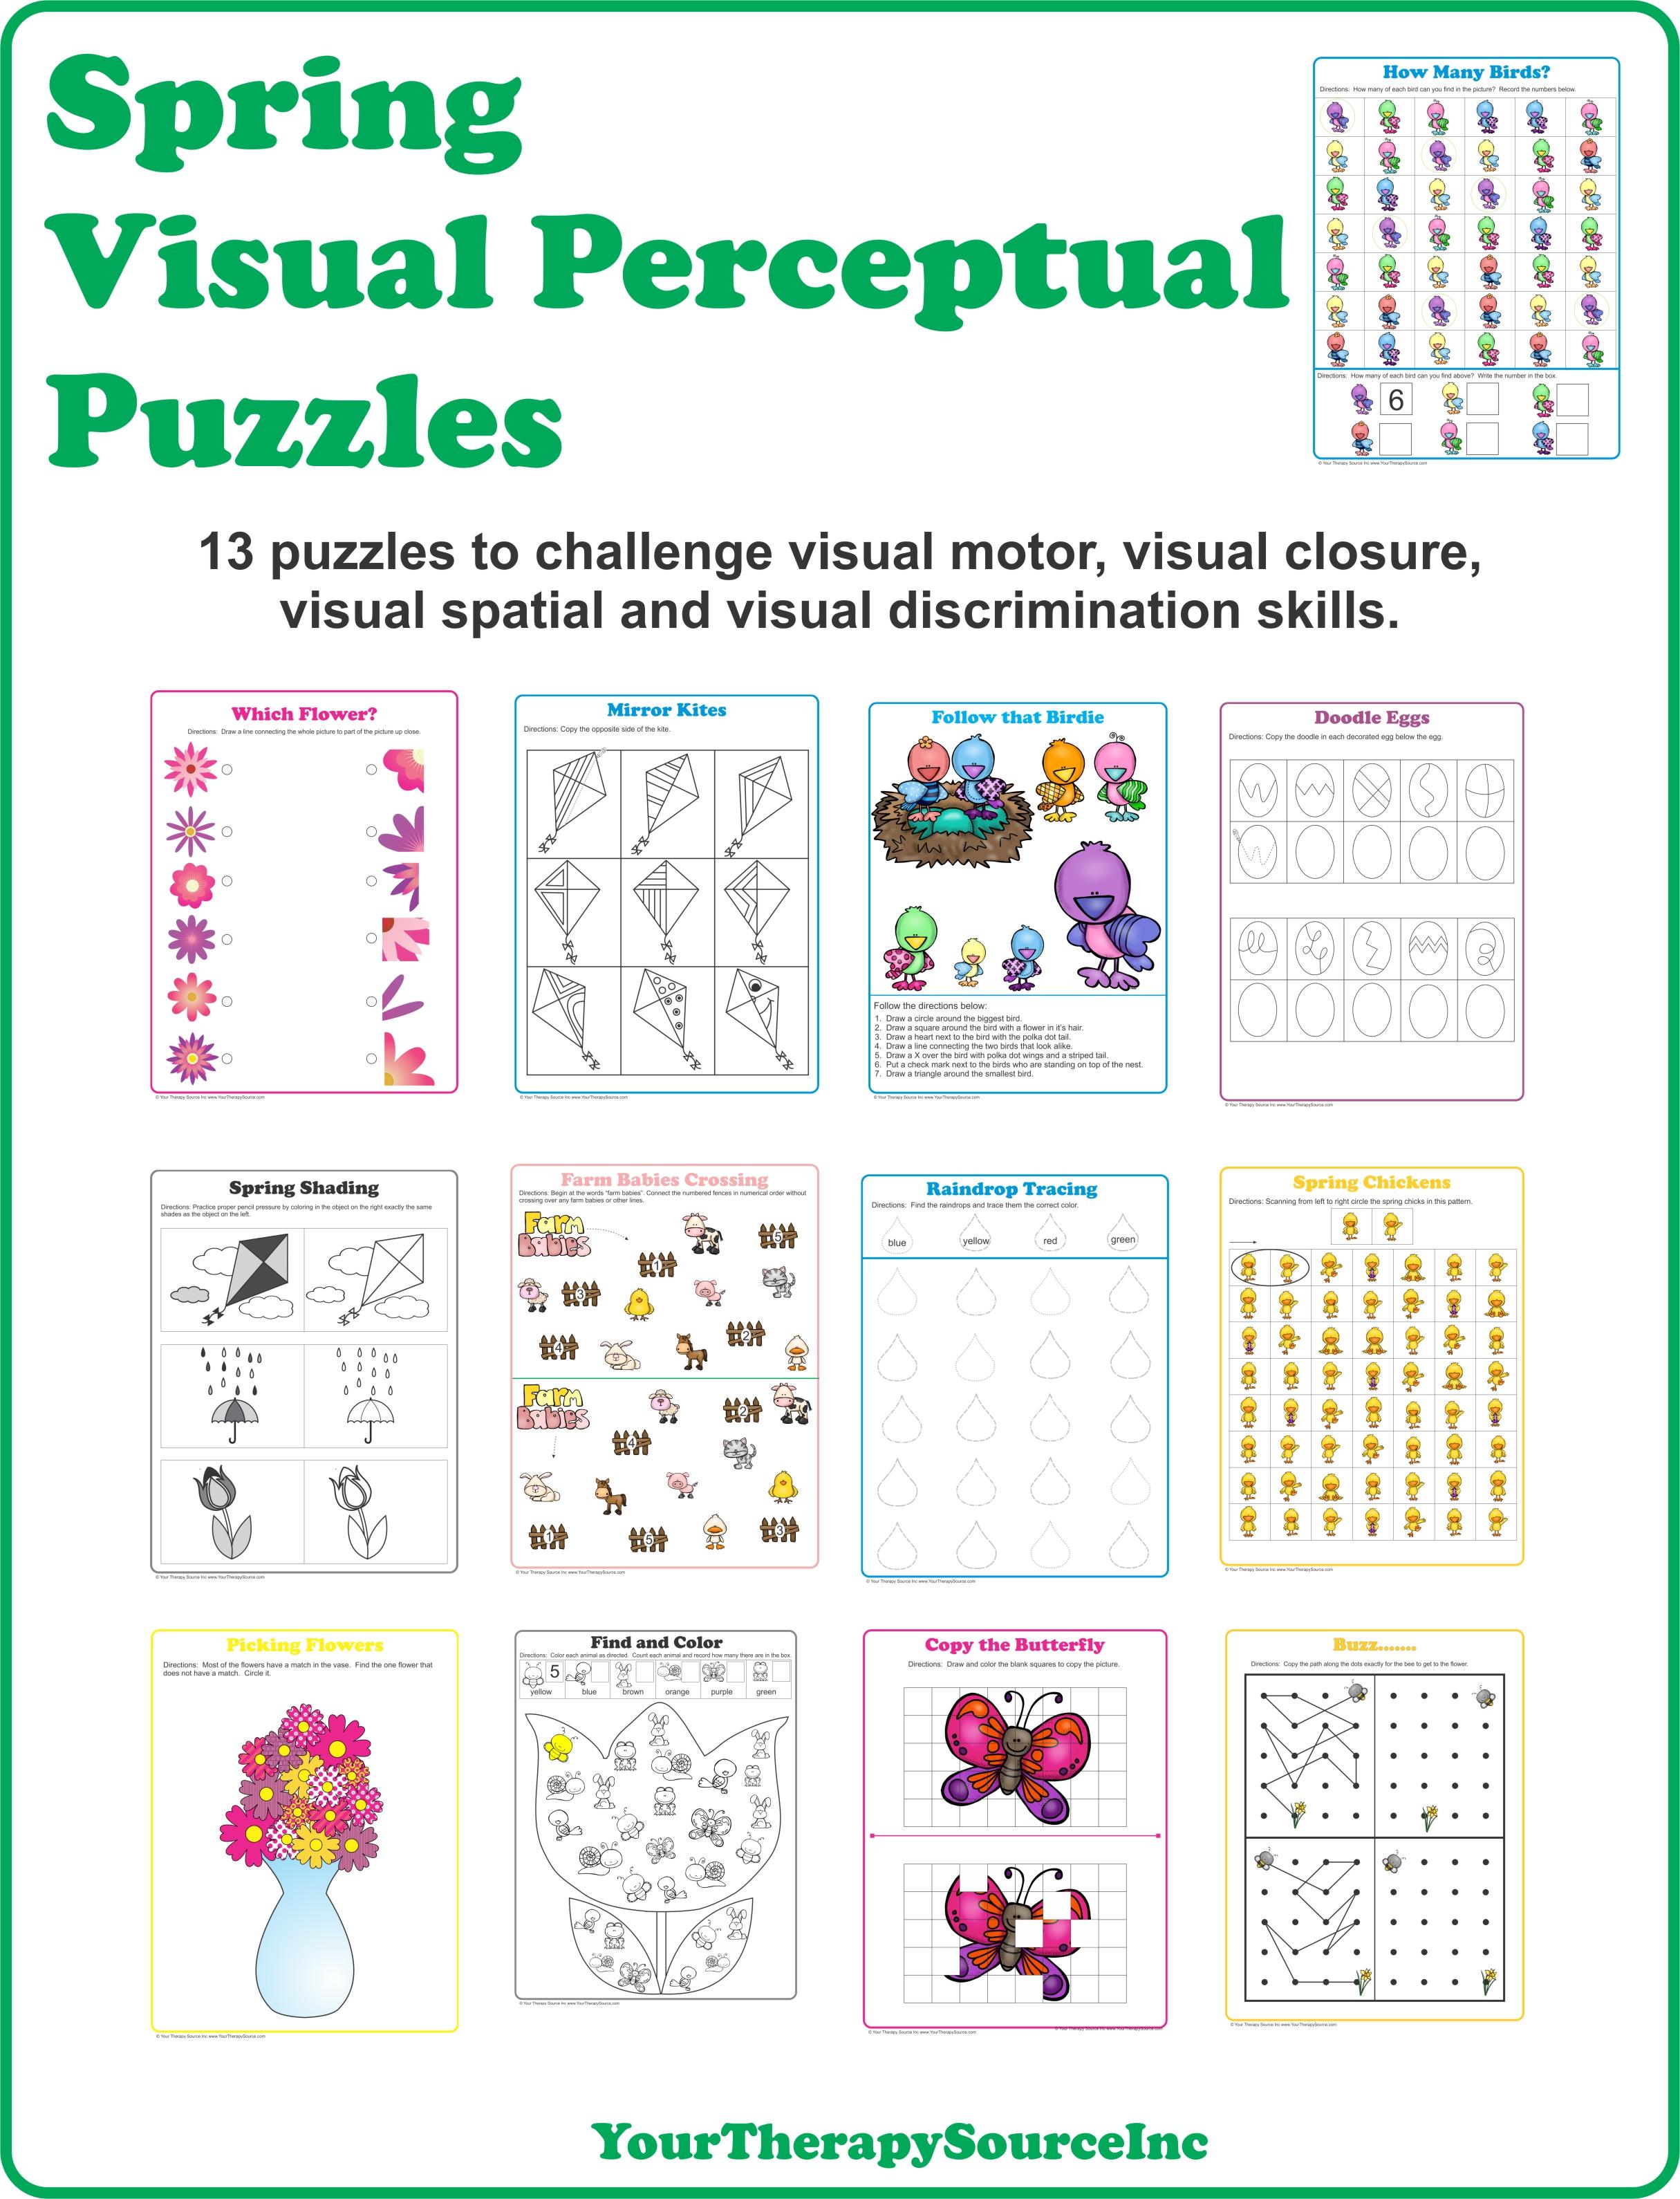 Spring Visual Perceptual Puzzles - Growing Play - Printable Visual Puzzles